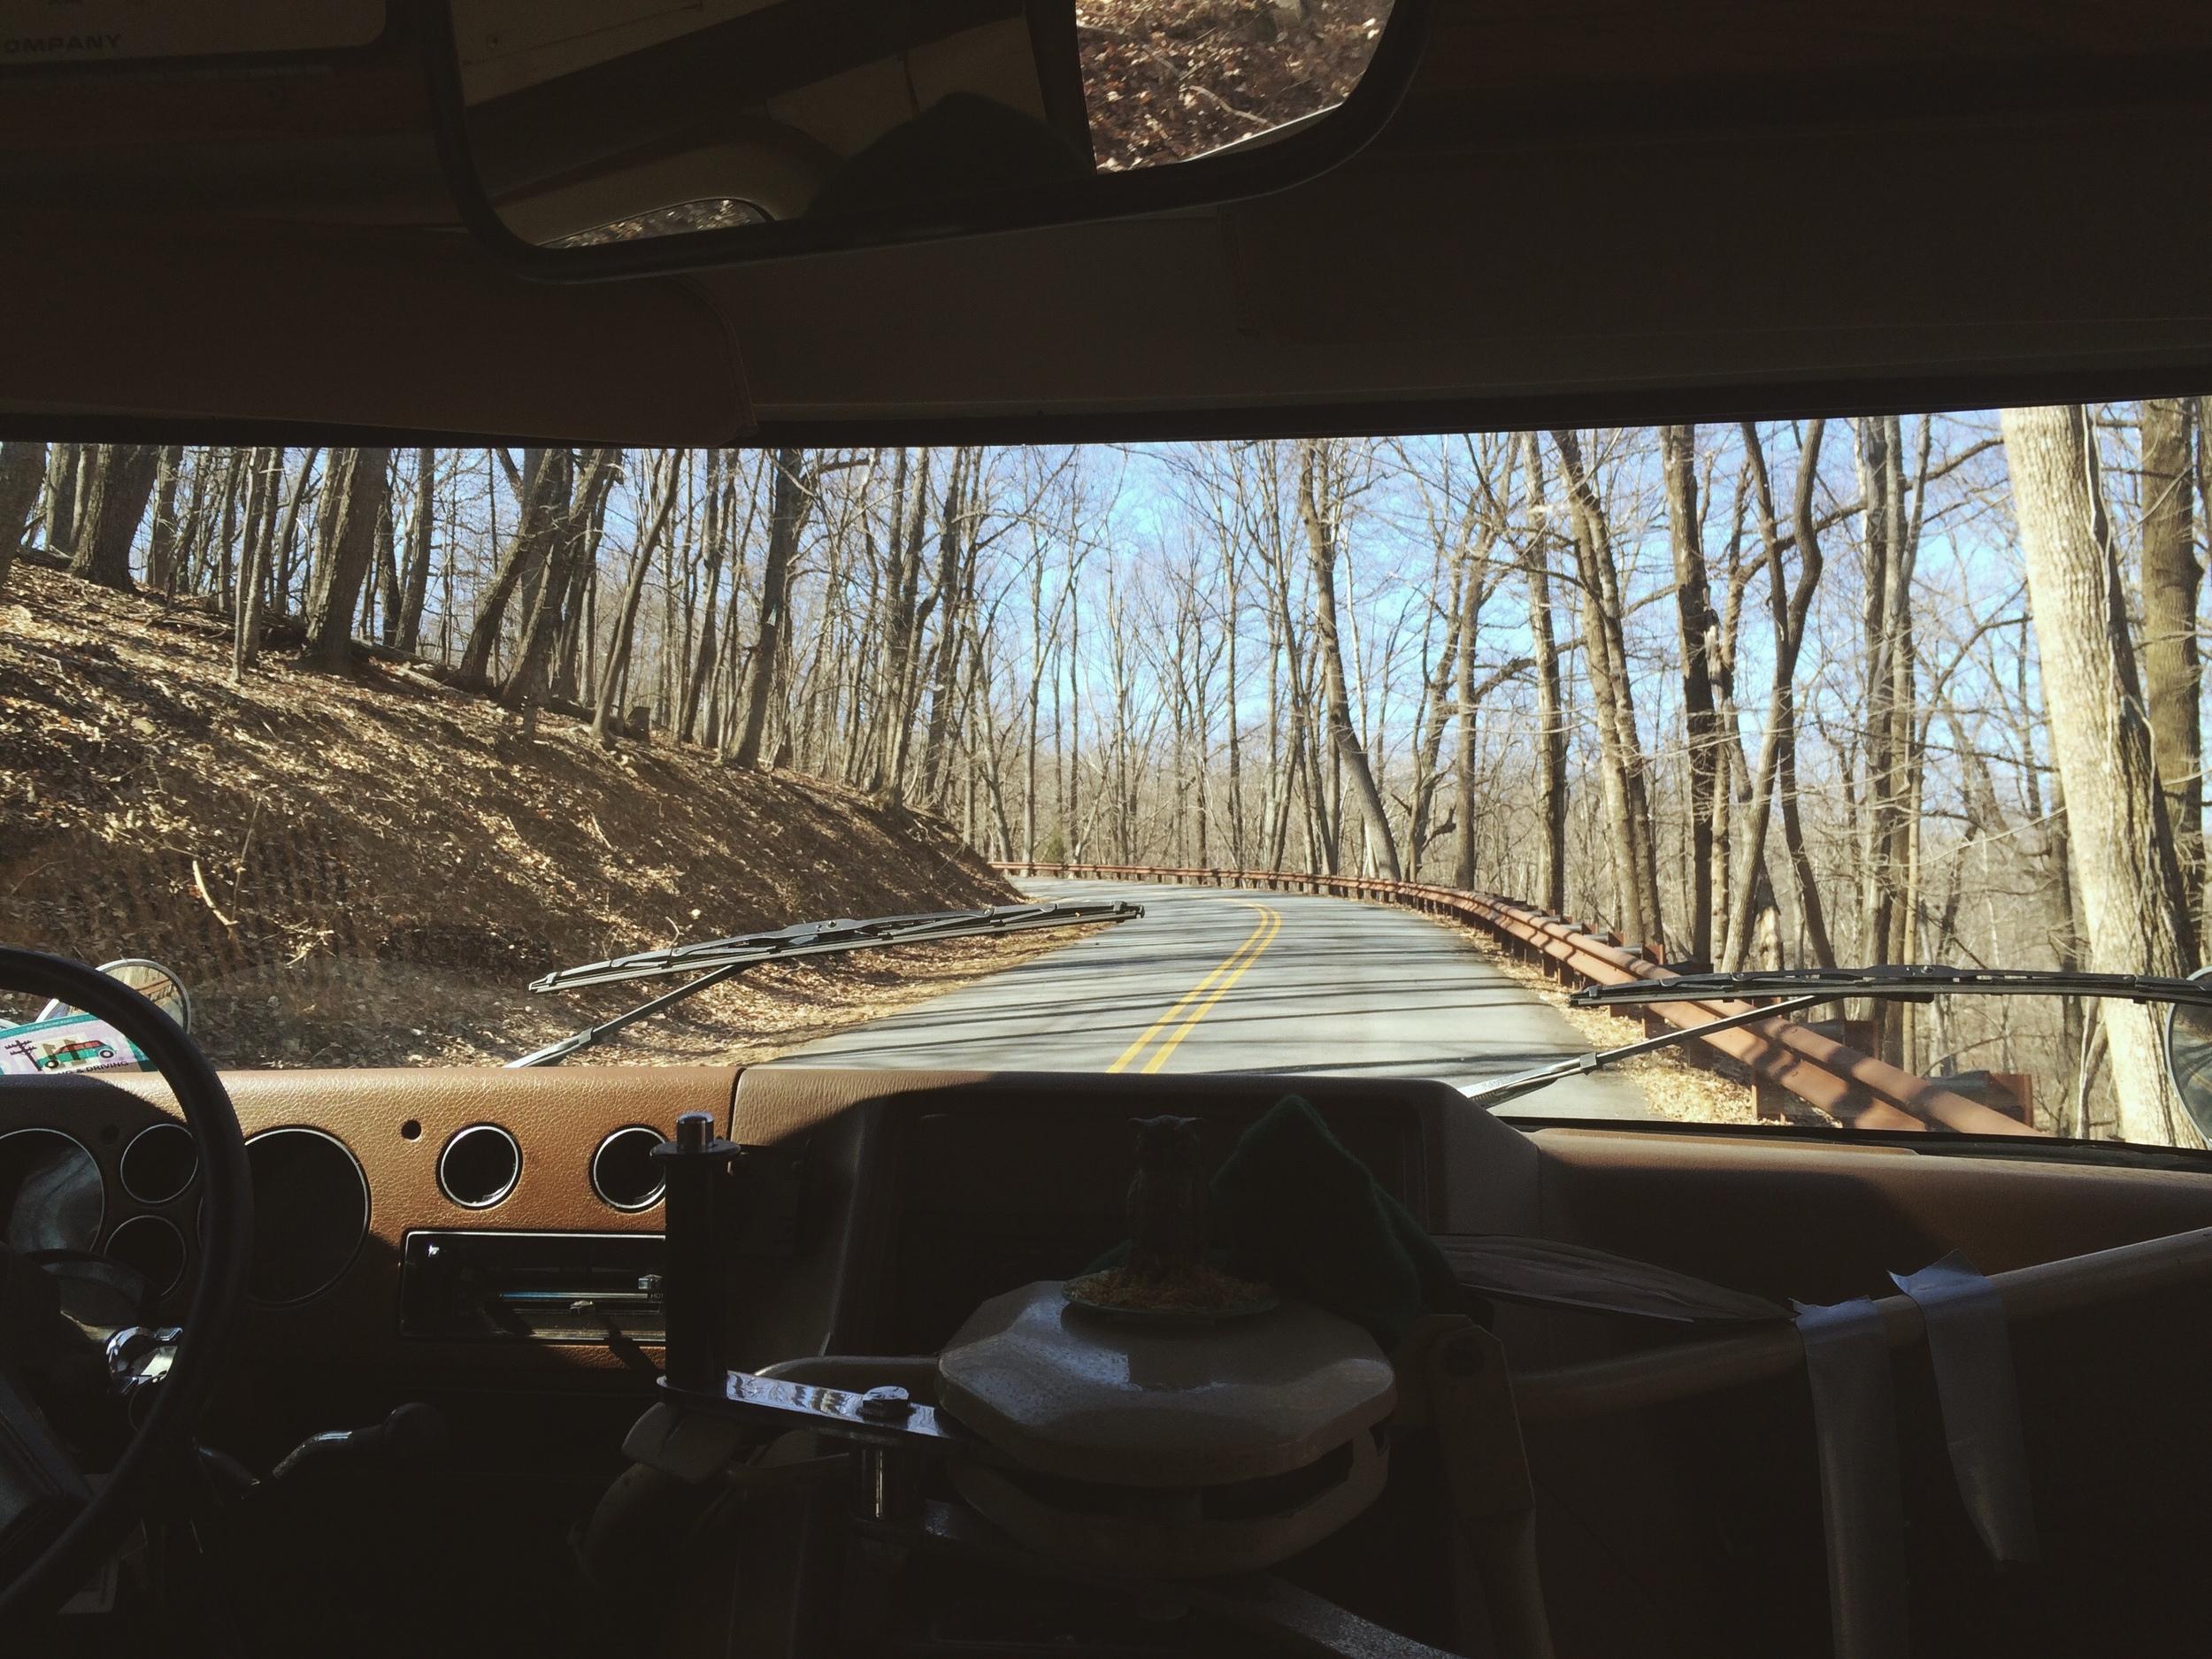 2.27.16 - A pretty high-up road. - Pilot Mountain, North Carolina